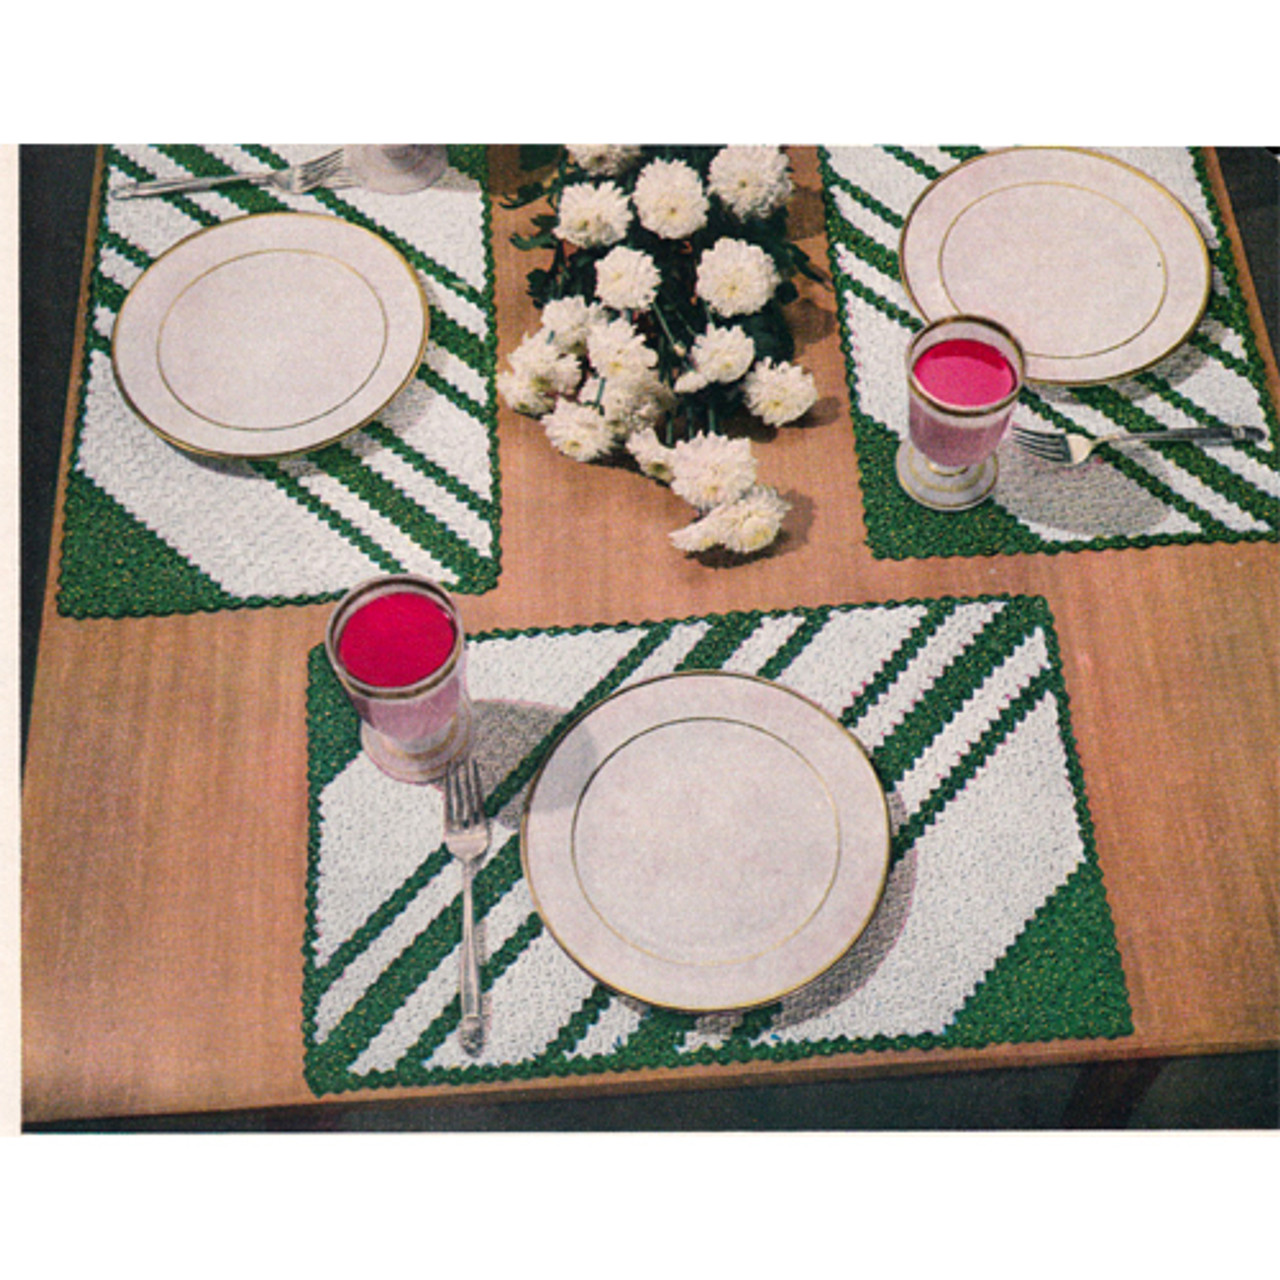 Crochet Mats Pattern with Diagonal Stripes